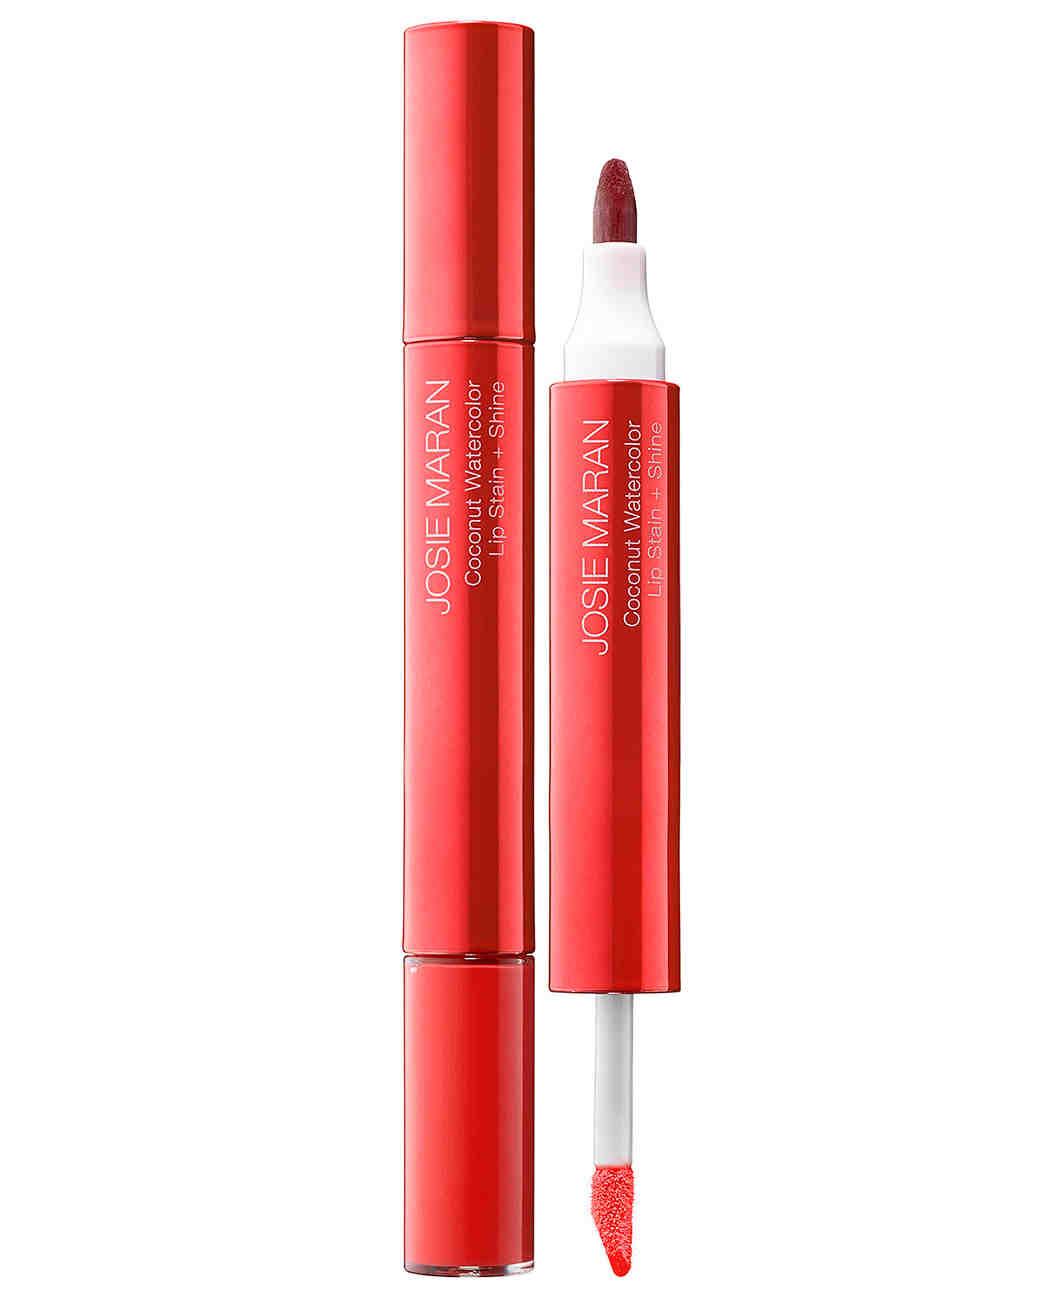 makeup-clutch-josie-maran-coconut-watercolor-lip-stain-shine-0715.jpg